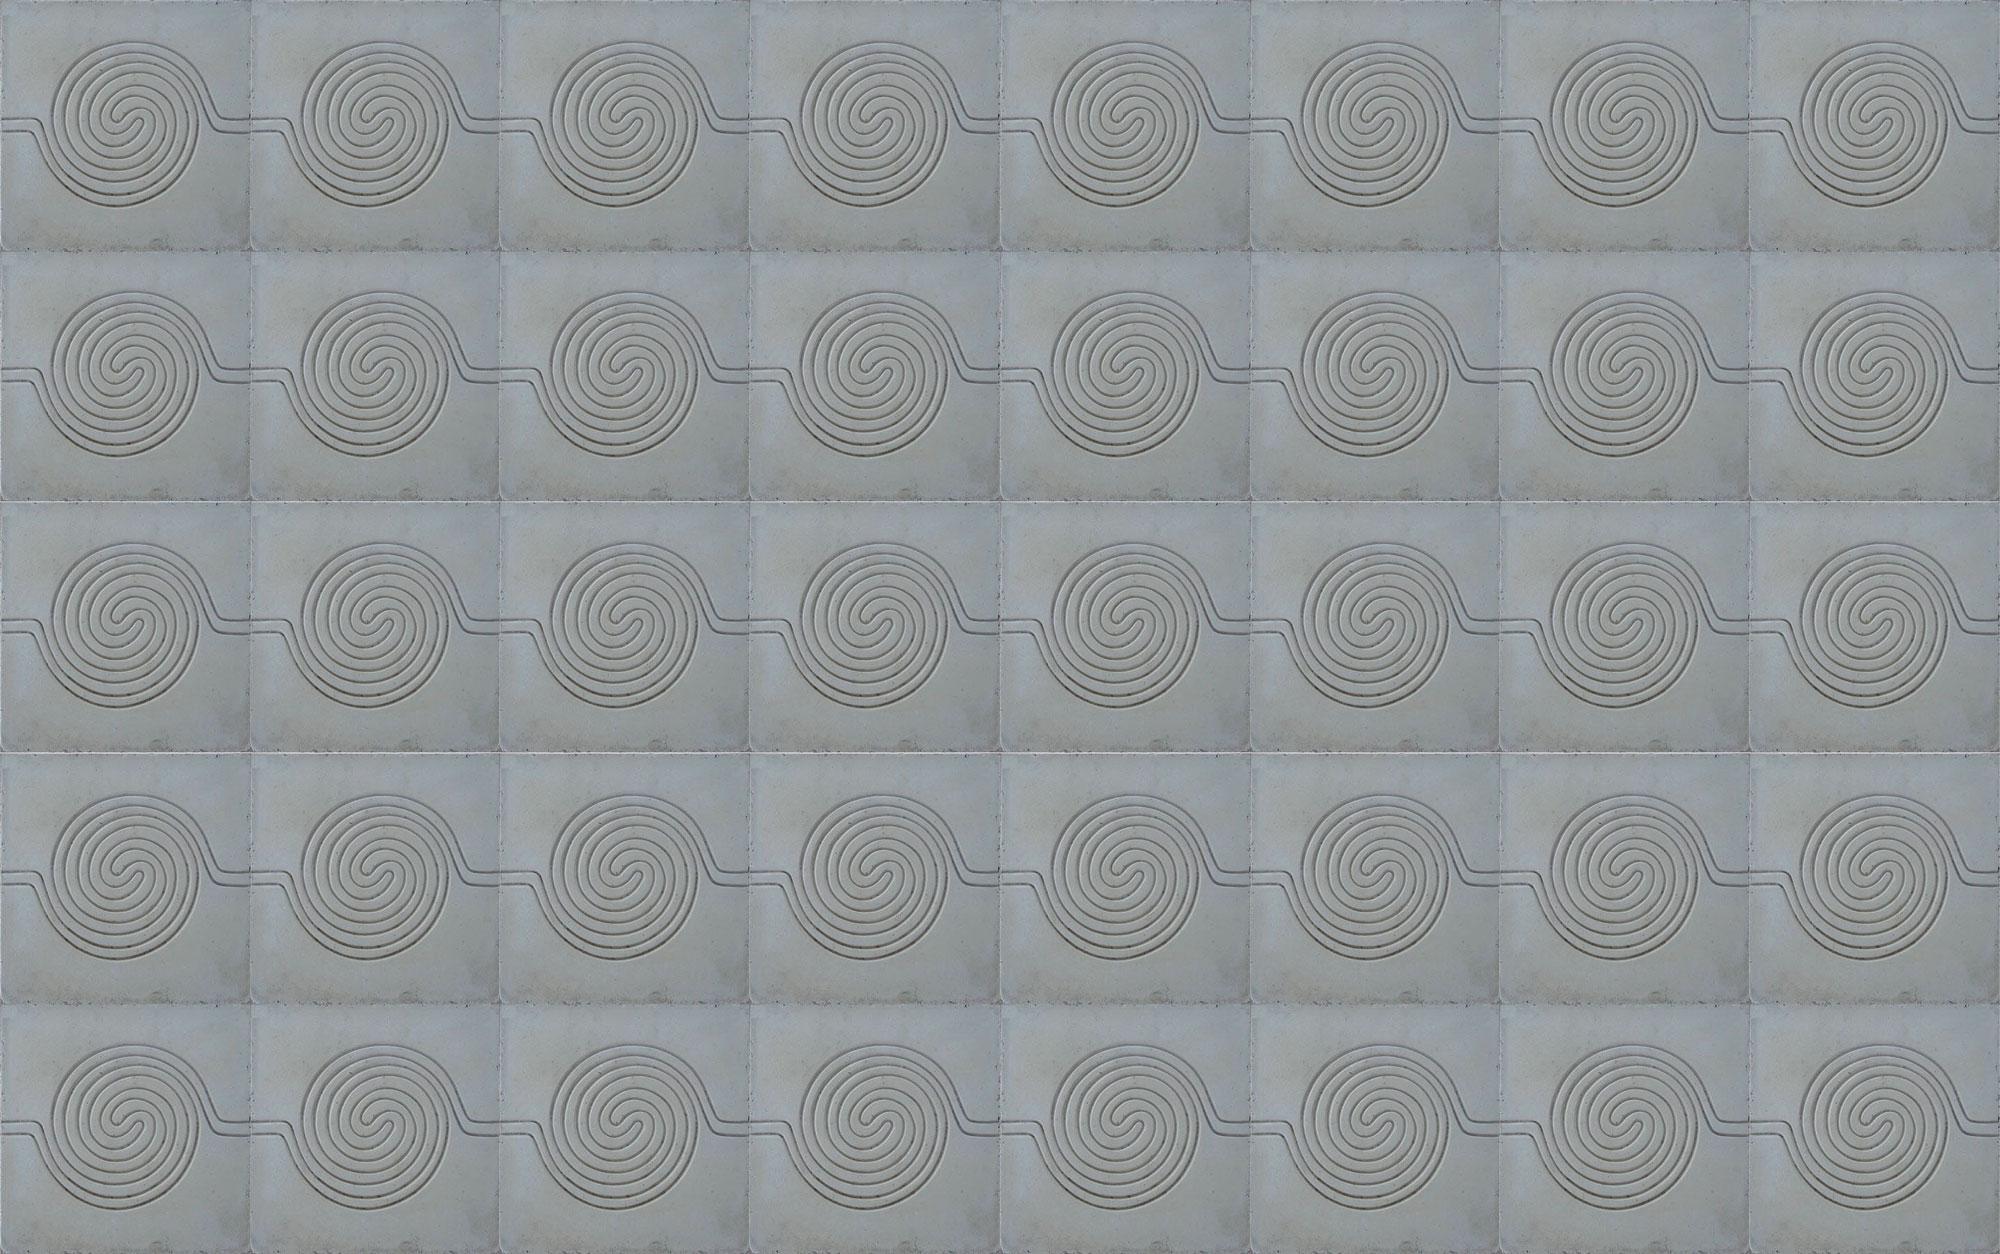 trine-ellitsgaard-espiral-grabado